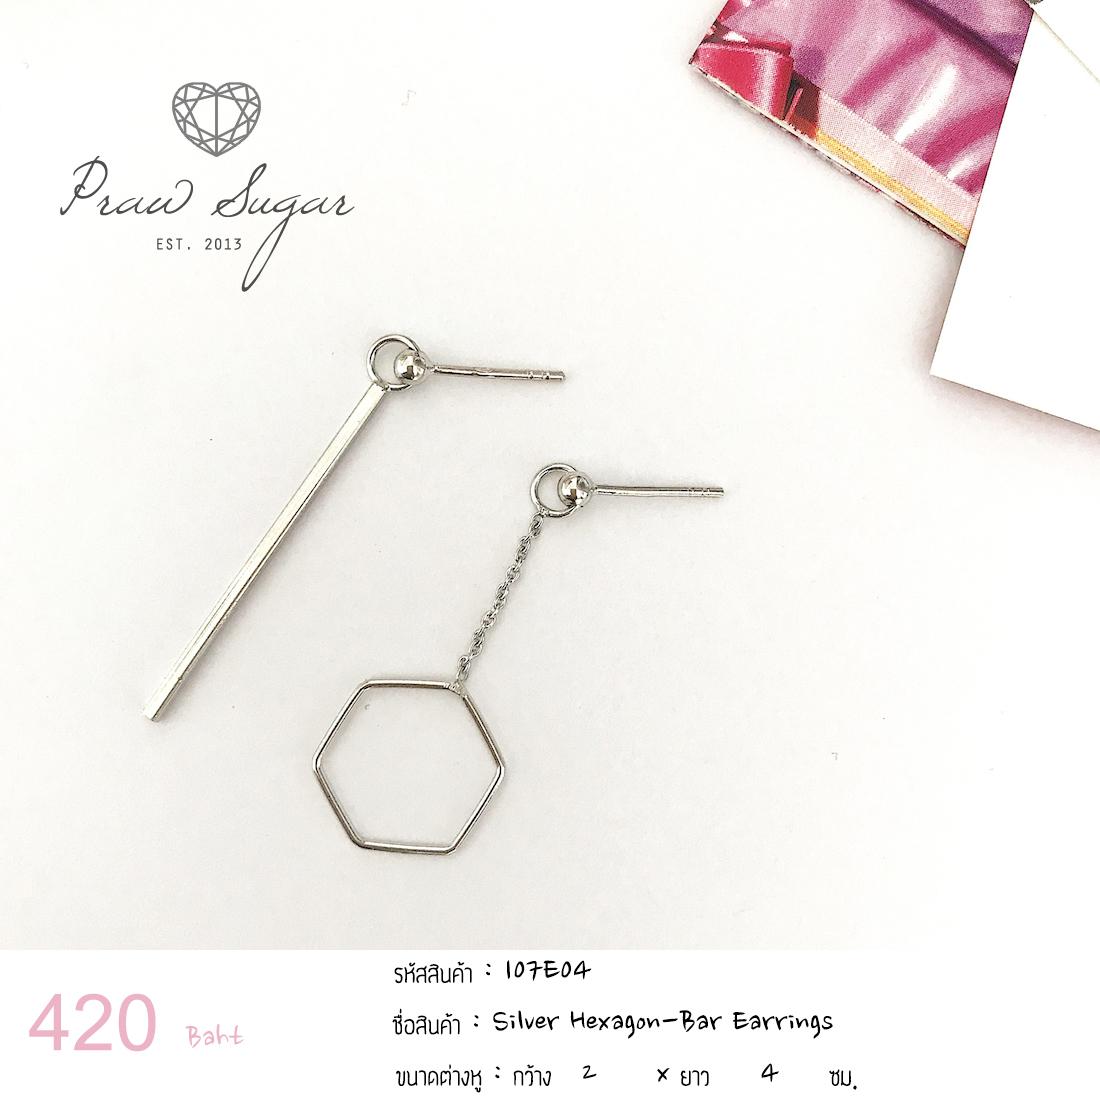 Silver Hexagon-Bar Earrings (เรือนทำจากเงินแท้)